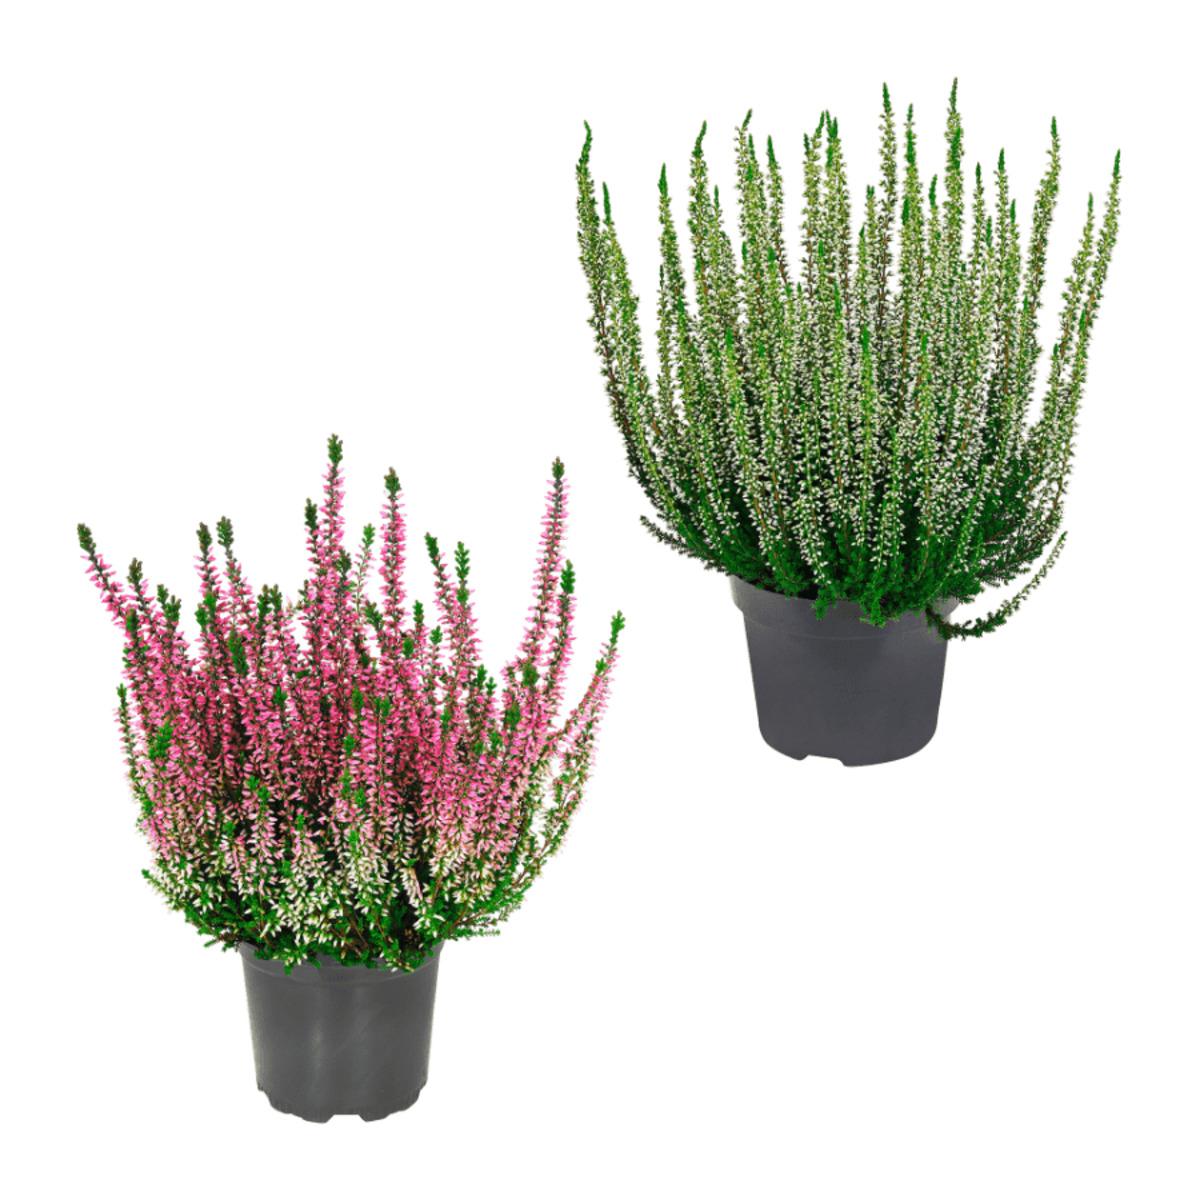 Bild 1 von GARDENLINE     Besenheide (Calluna vulgaris)